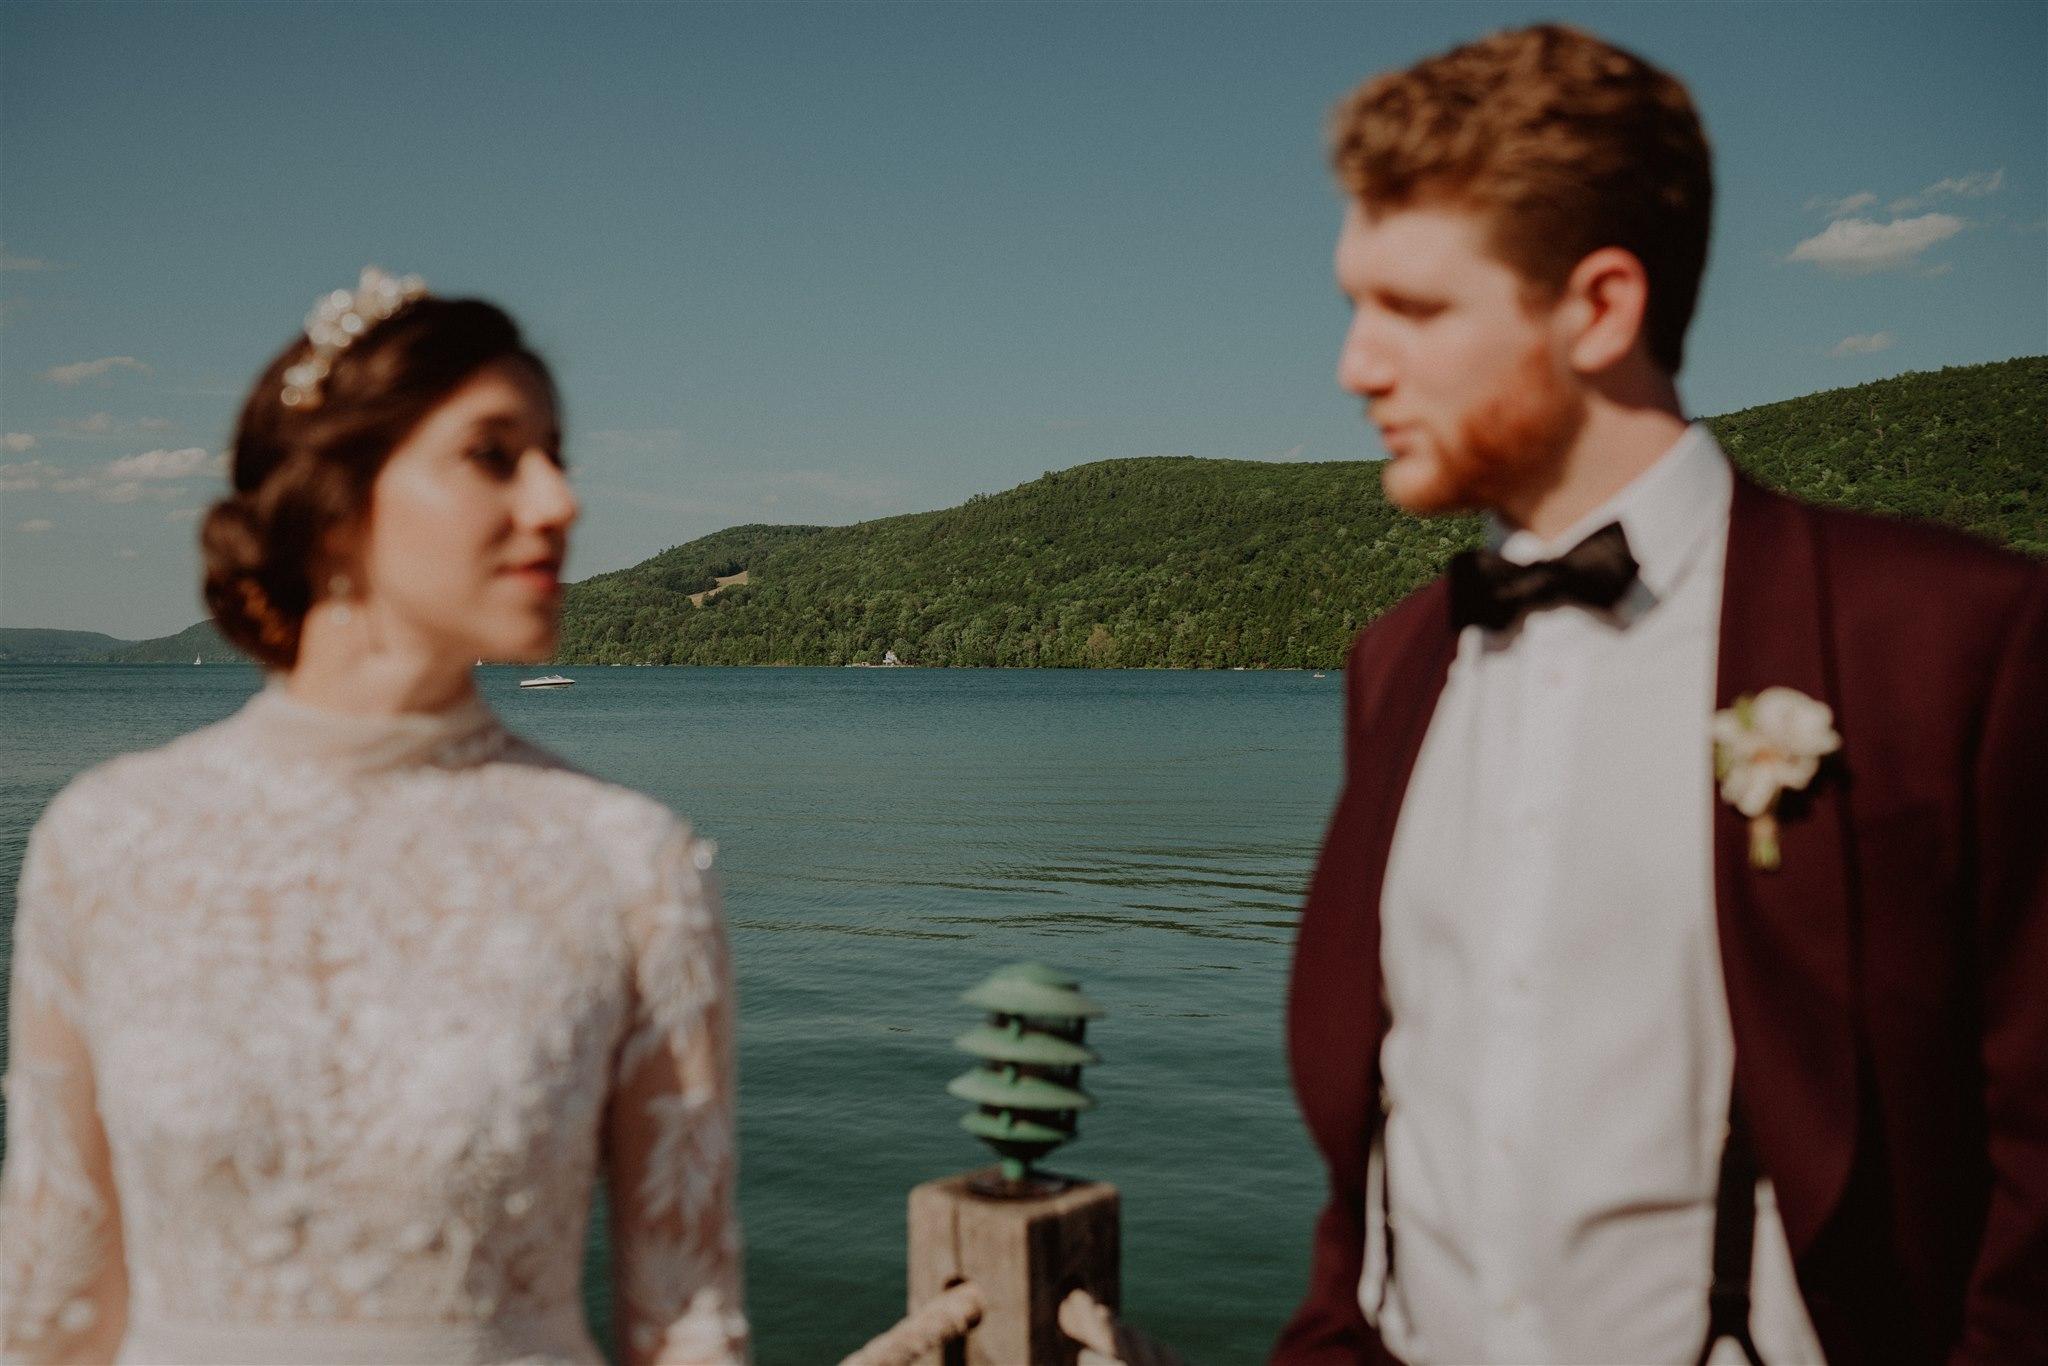 Chellise_Michael_Photography_Hudson_Valley_Wedding_Photographer_Otesaga_Hotel-4064.jpg